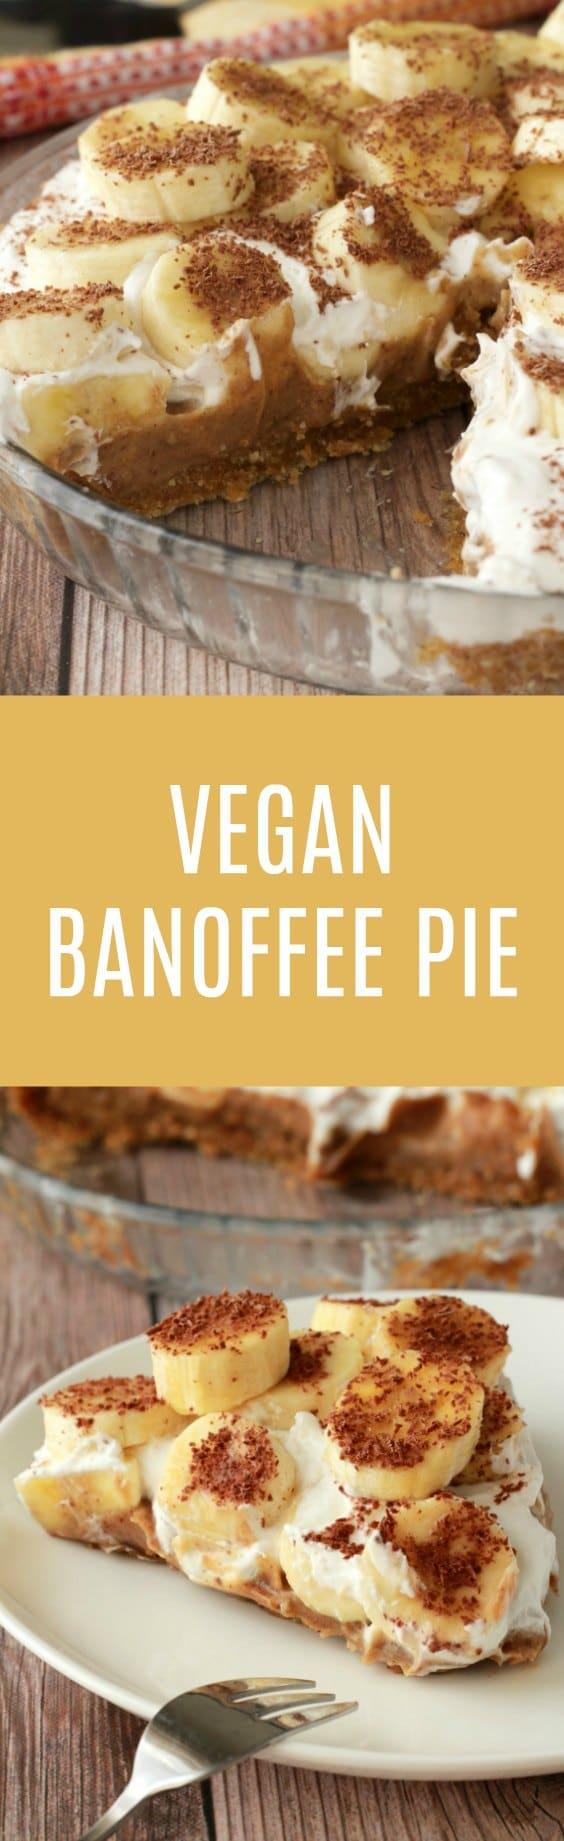 Insanely delicious no-bake vegan banoffee pie with a walnut date crust, date caramel center and whipped coconut cream topping. Vegan | Raw Vegan | Vegan Dessert | Vegan Recipes | Gluten Free | Gluten Free Vegan | Dairy Free | lovingitvegan.com